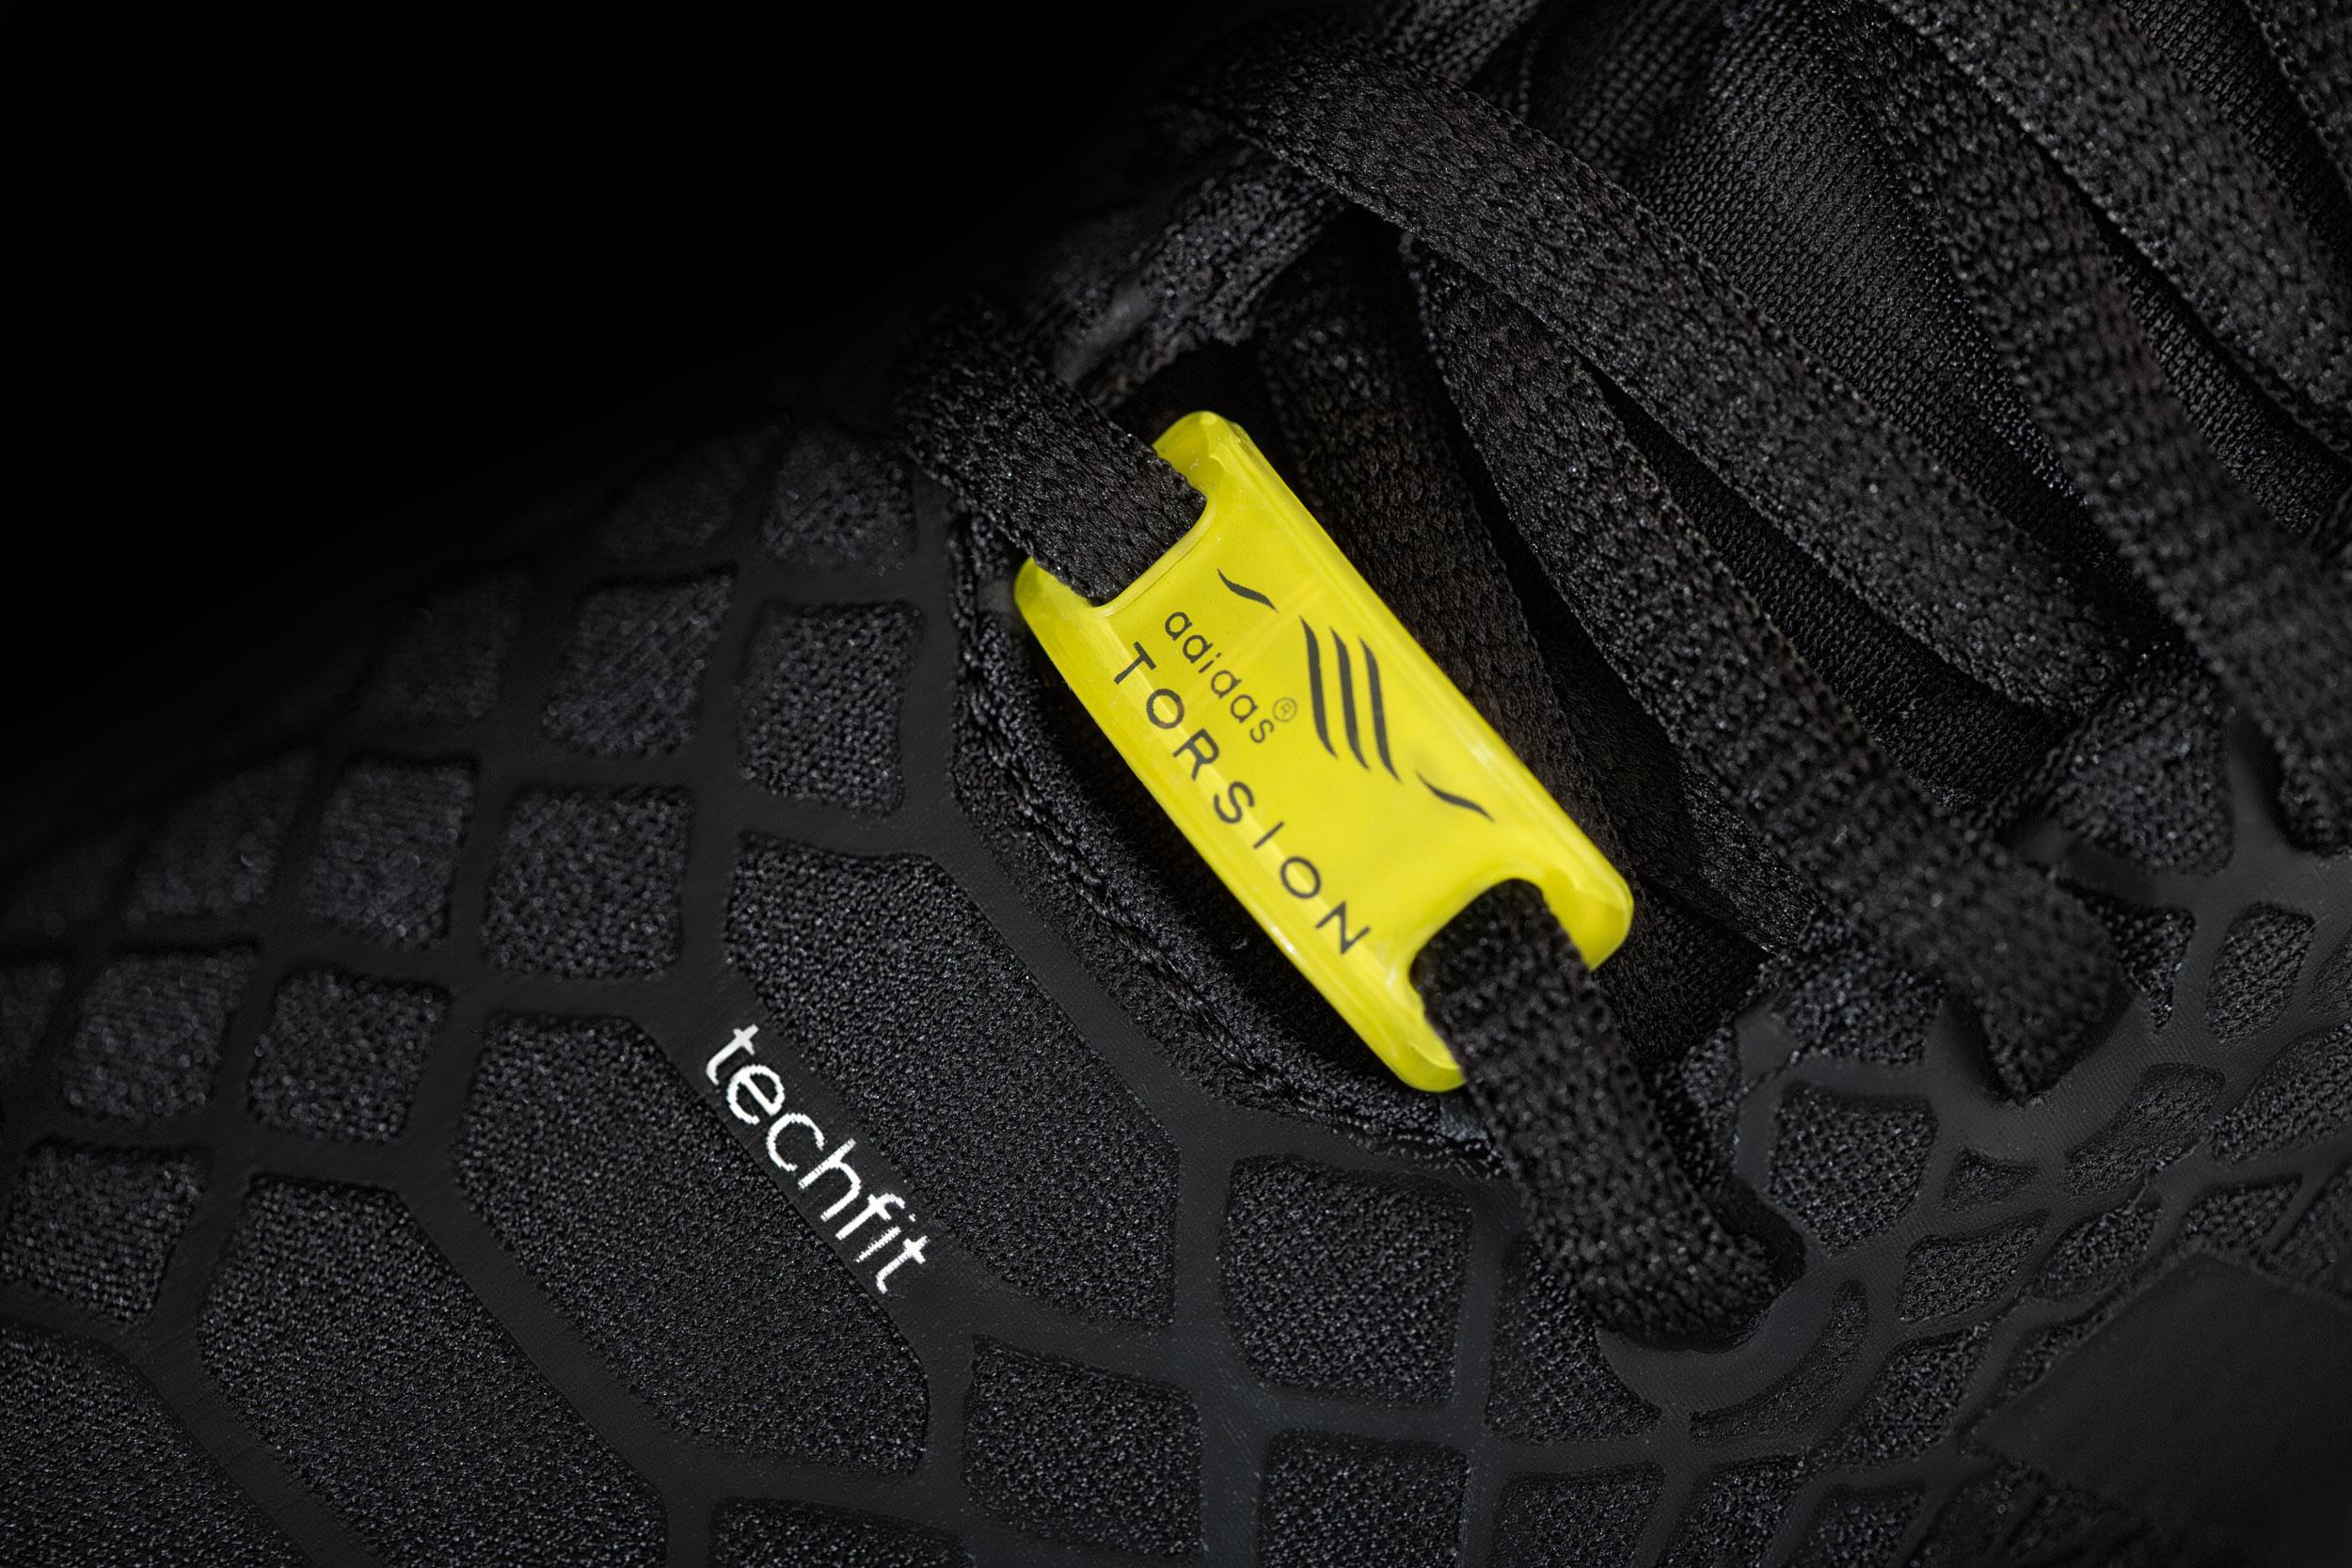 kodiac_project_adidas_02.jpg